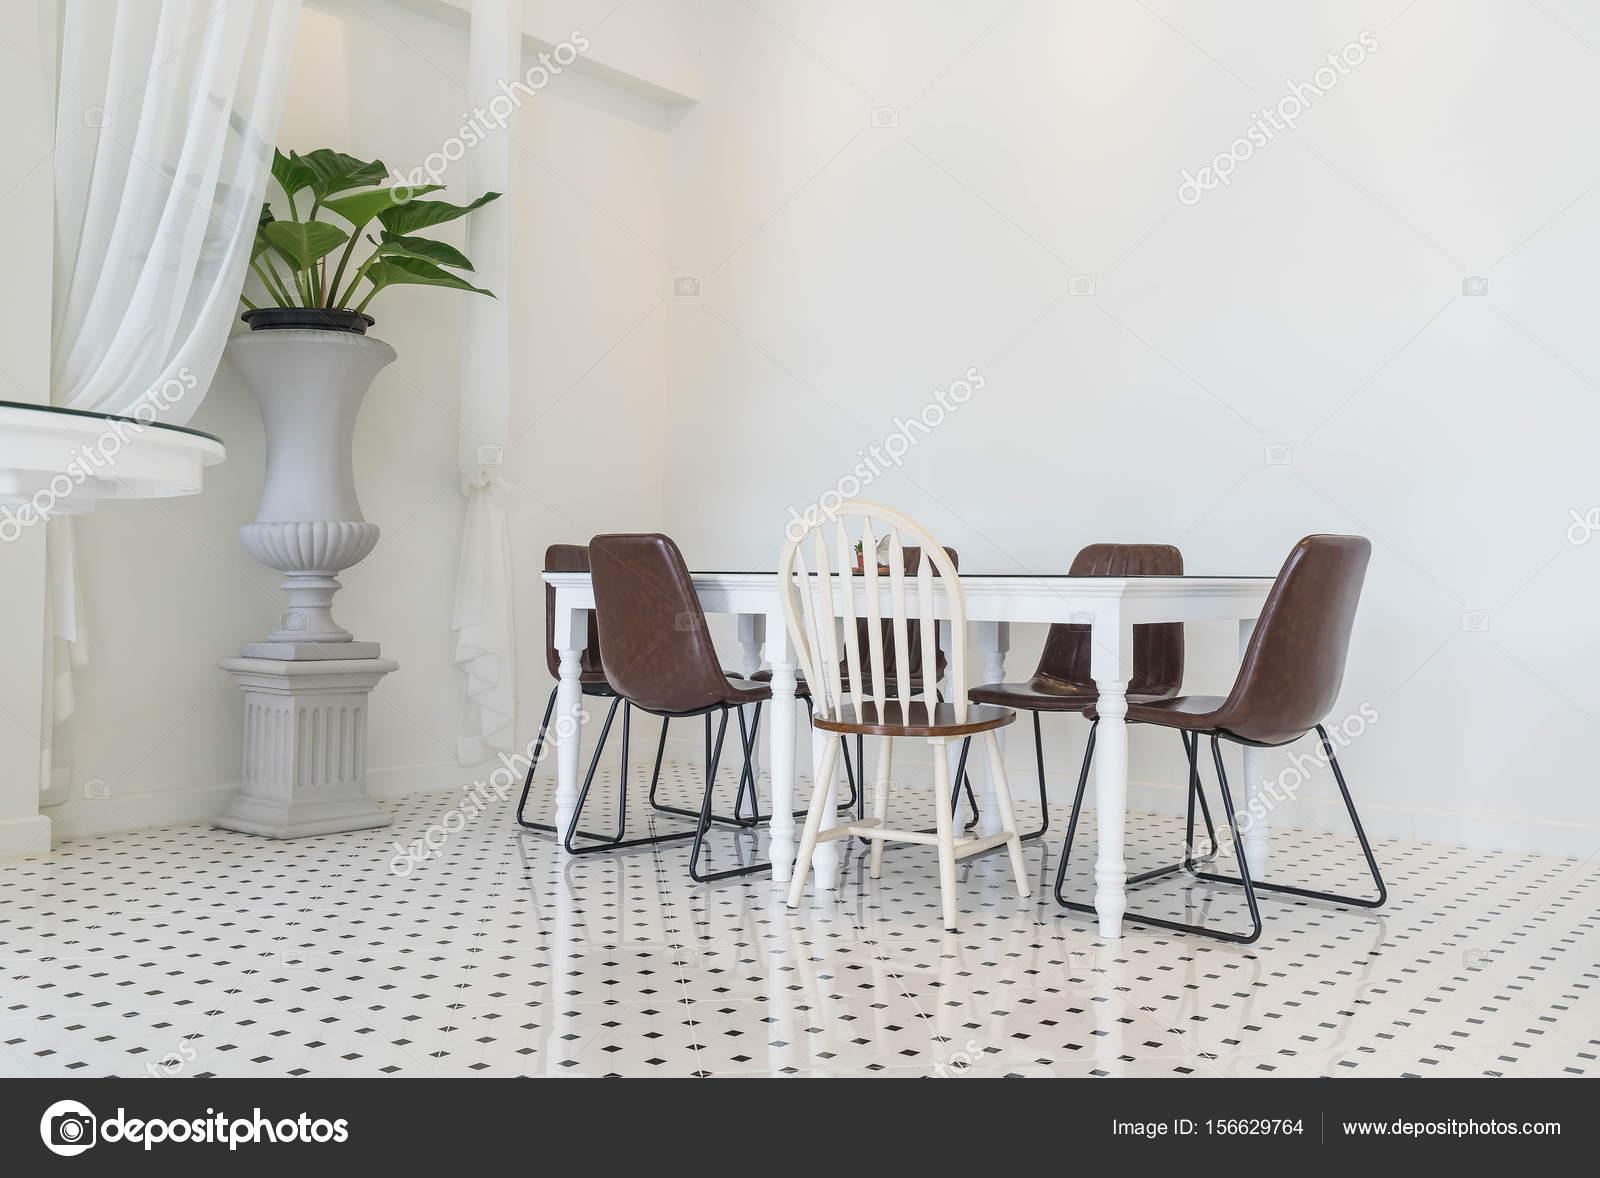 Lege eettafel interieurdecoratie u stockfoto topntp